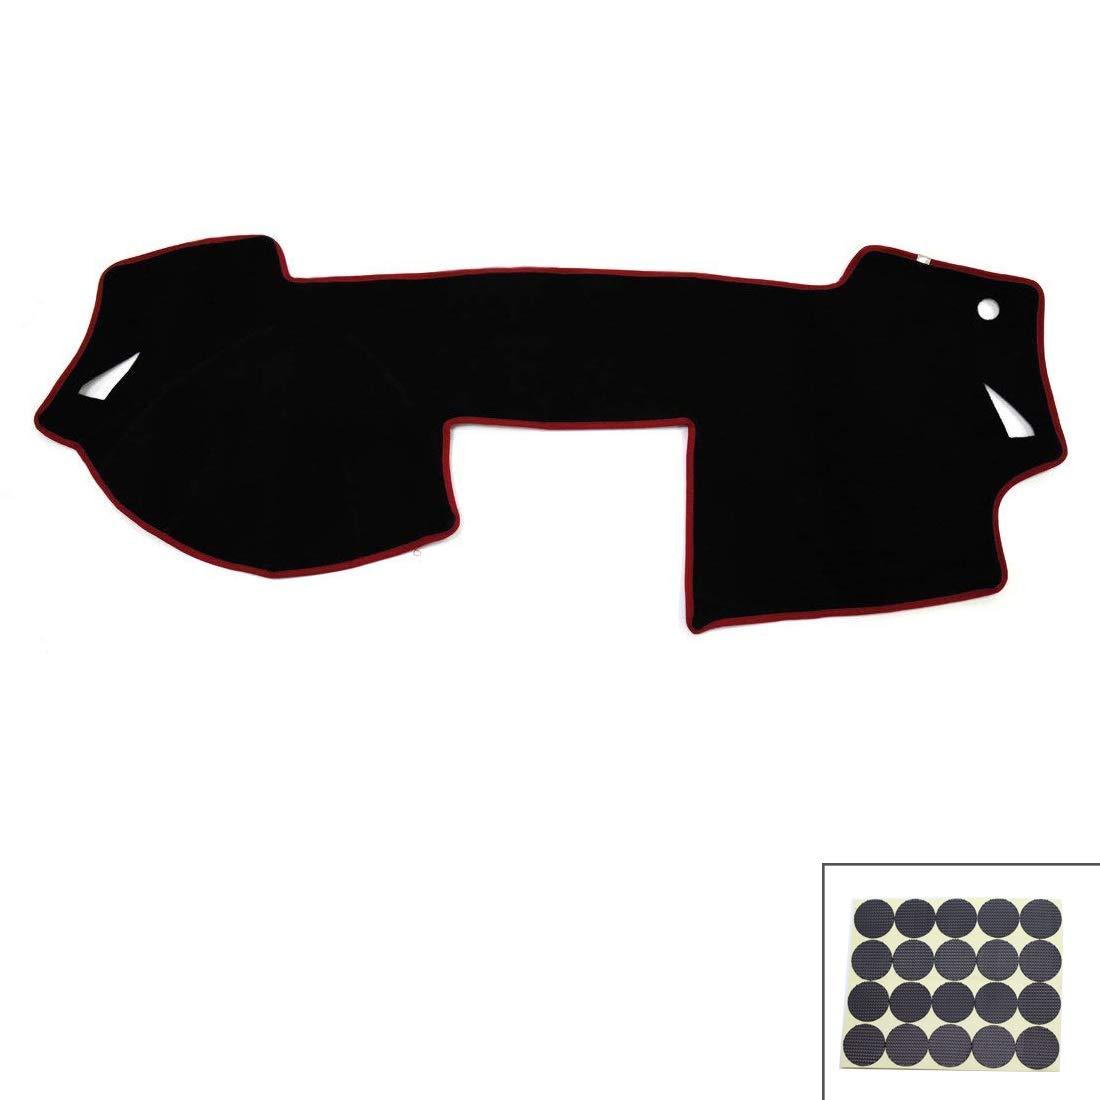 Autoly Black Car Inner Dash Dashboard Cover Shield Sun Carpet Pad for Mazda 6 Atenza